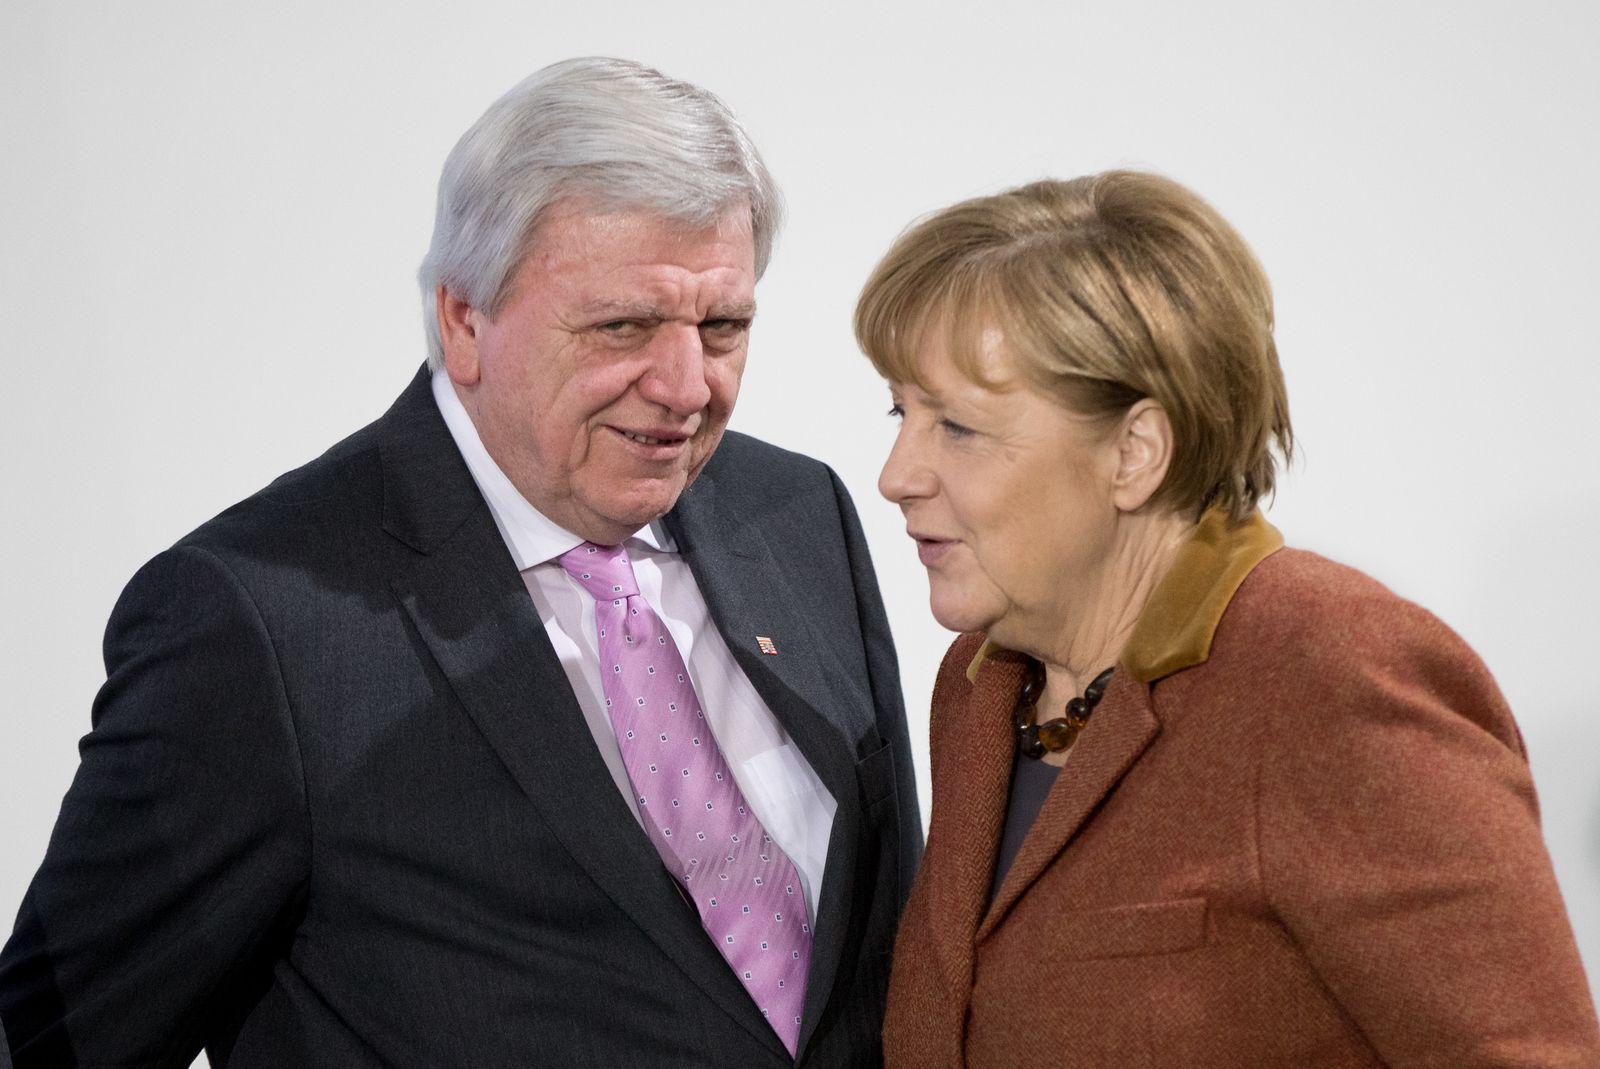 Angela Merkel/ Volker Bouffier